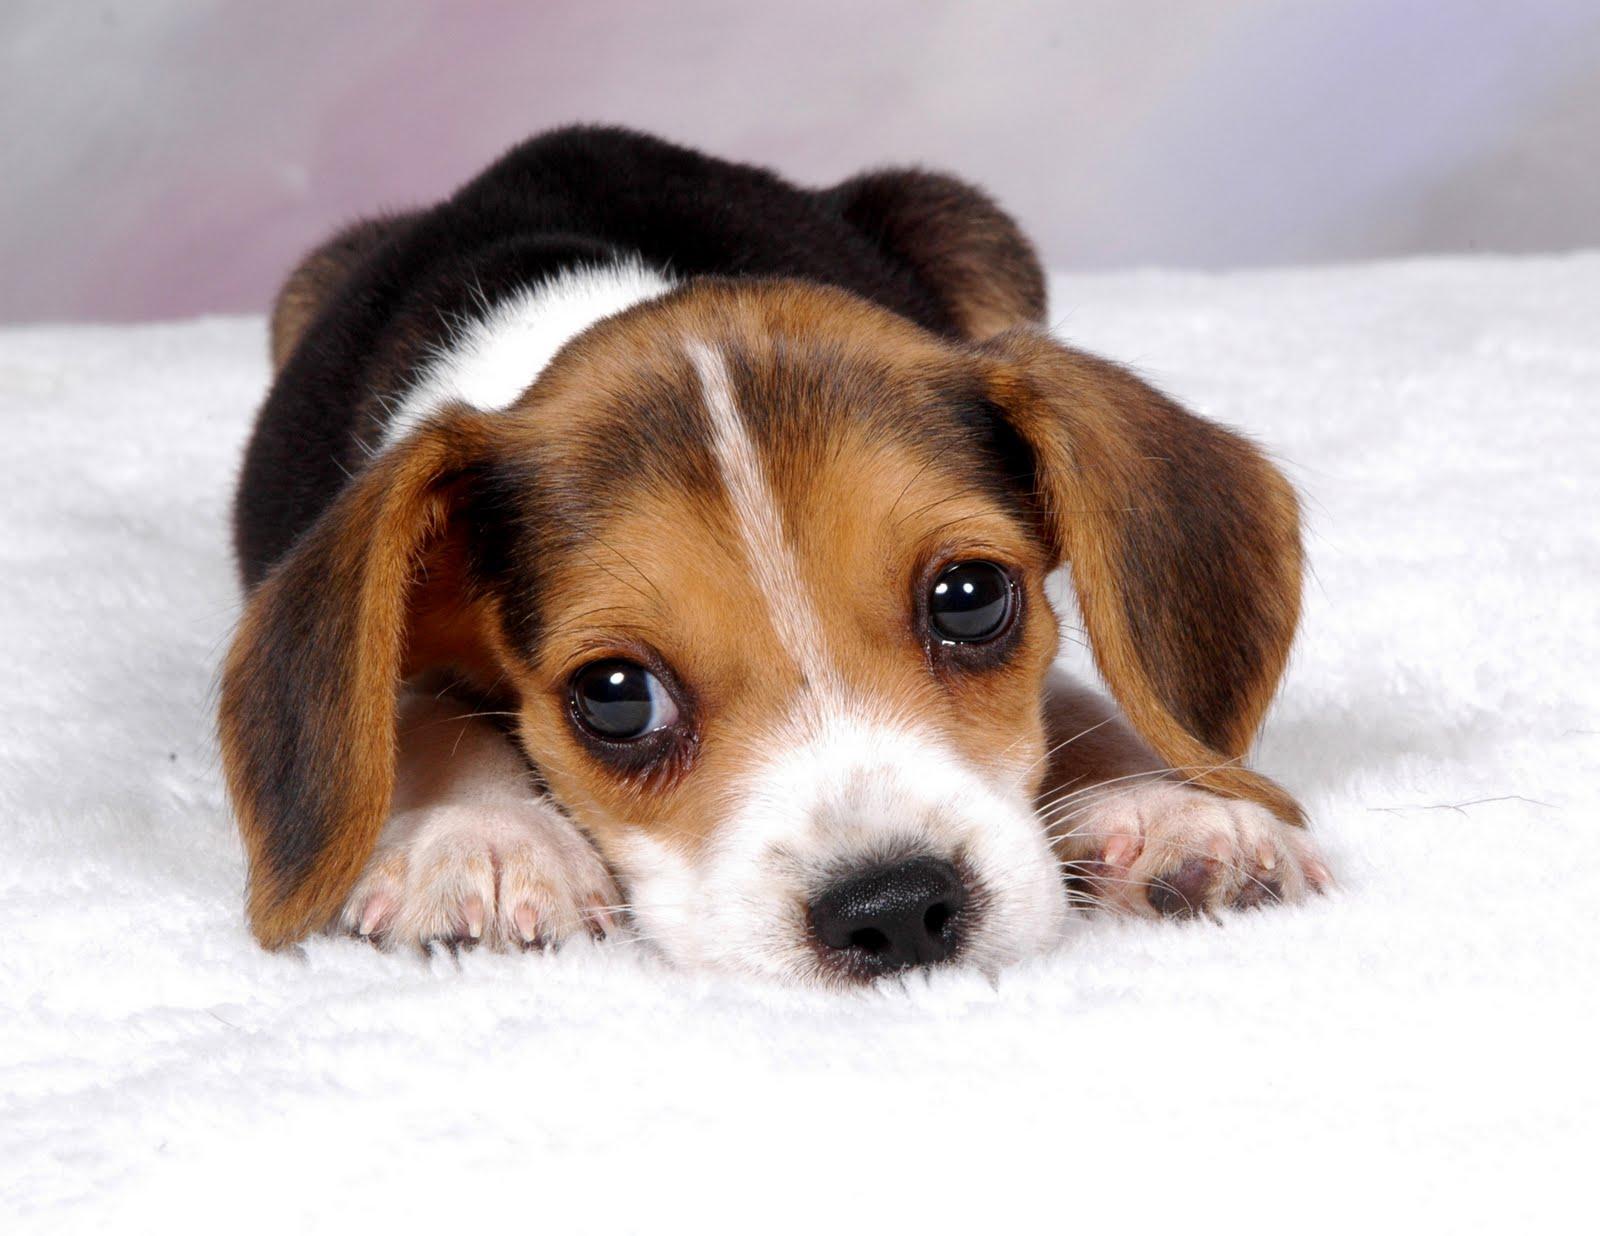 Puppy Backgrounds wallpaper Beagle Puppy Backgrounds hd wallpaper 1600x1236